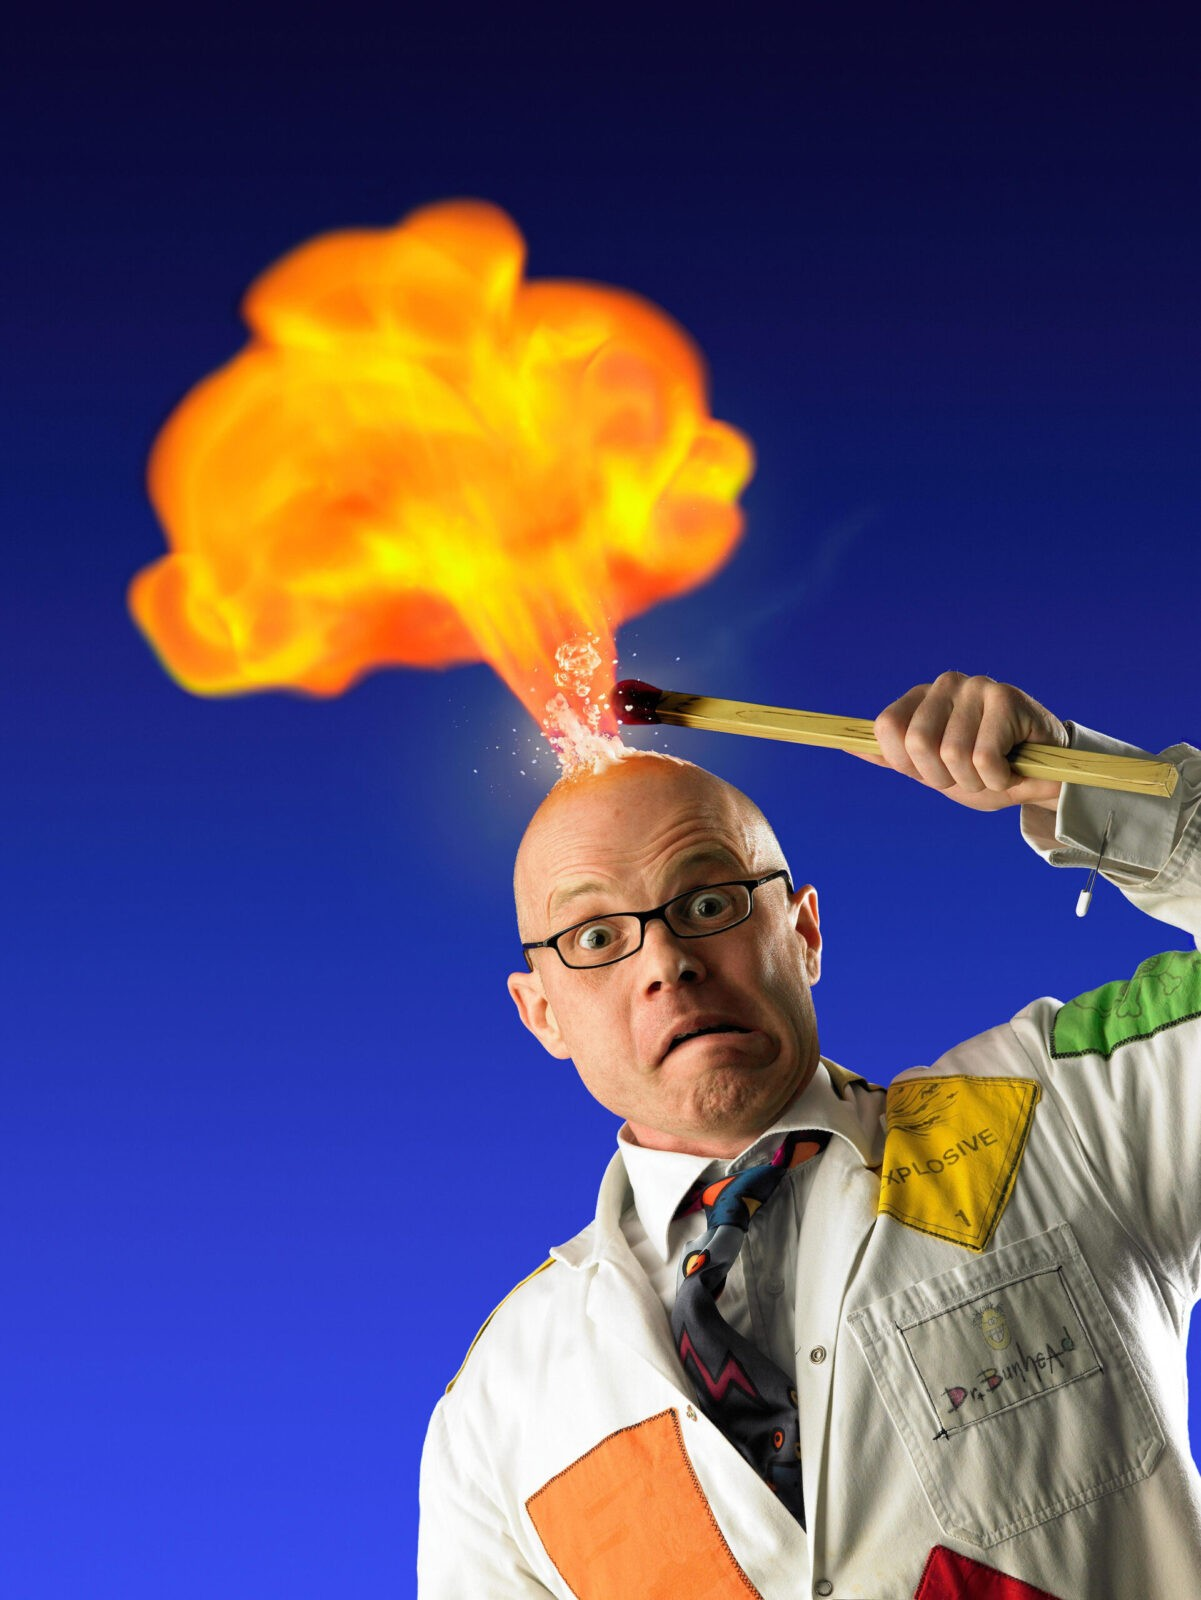 Dr. Bunhead setting flame in his head